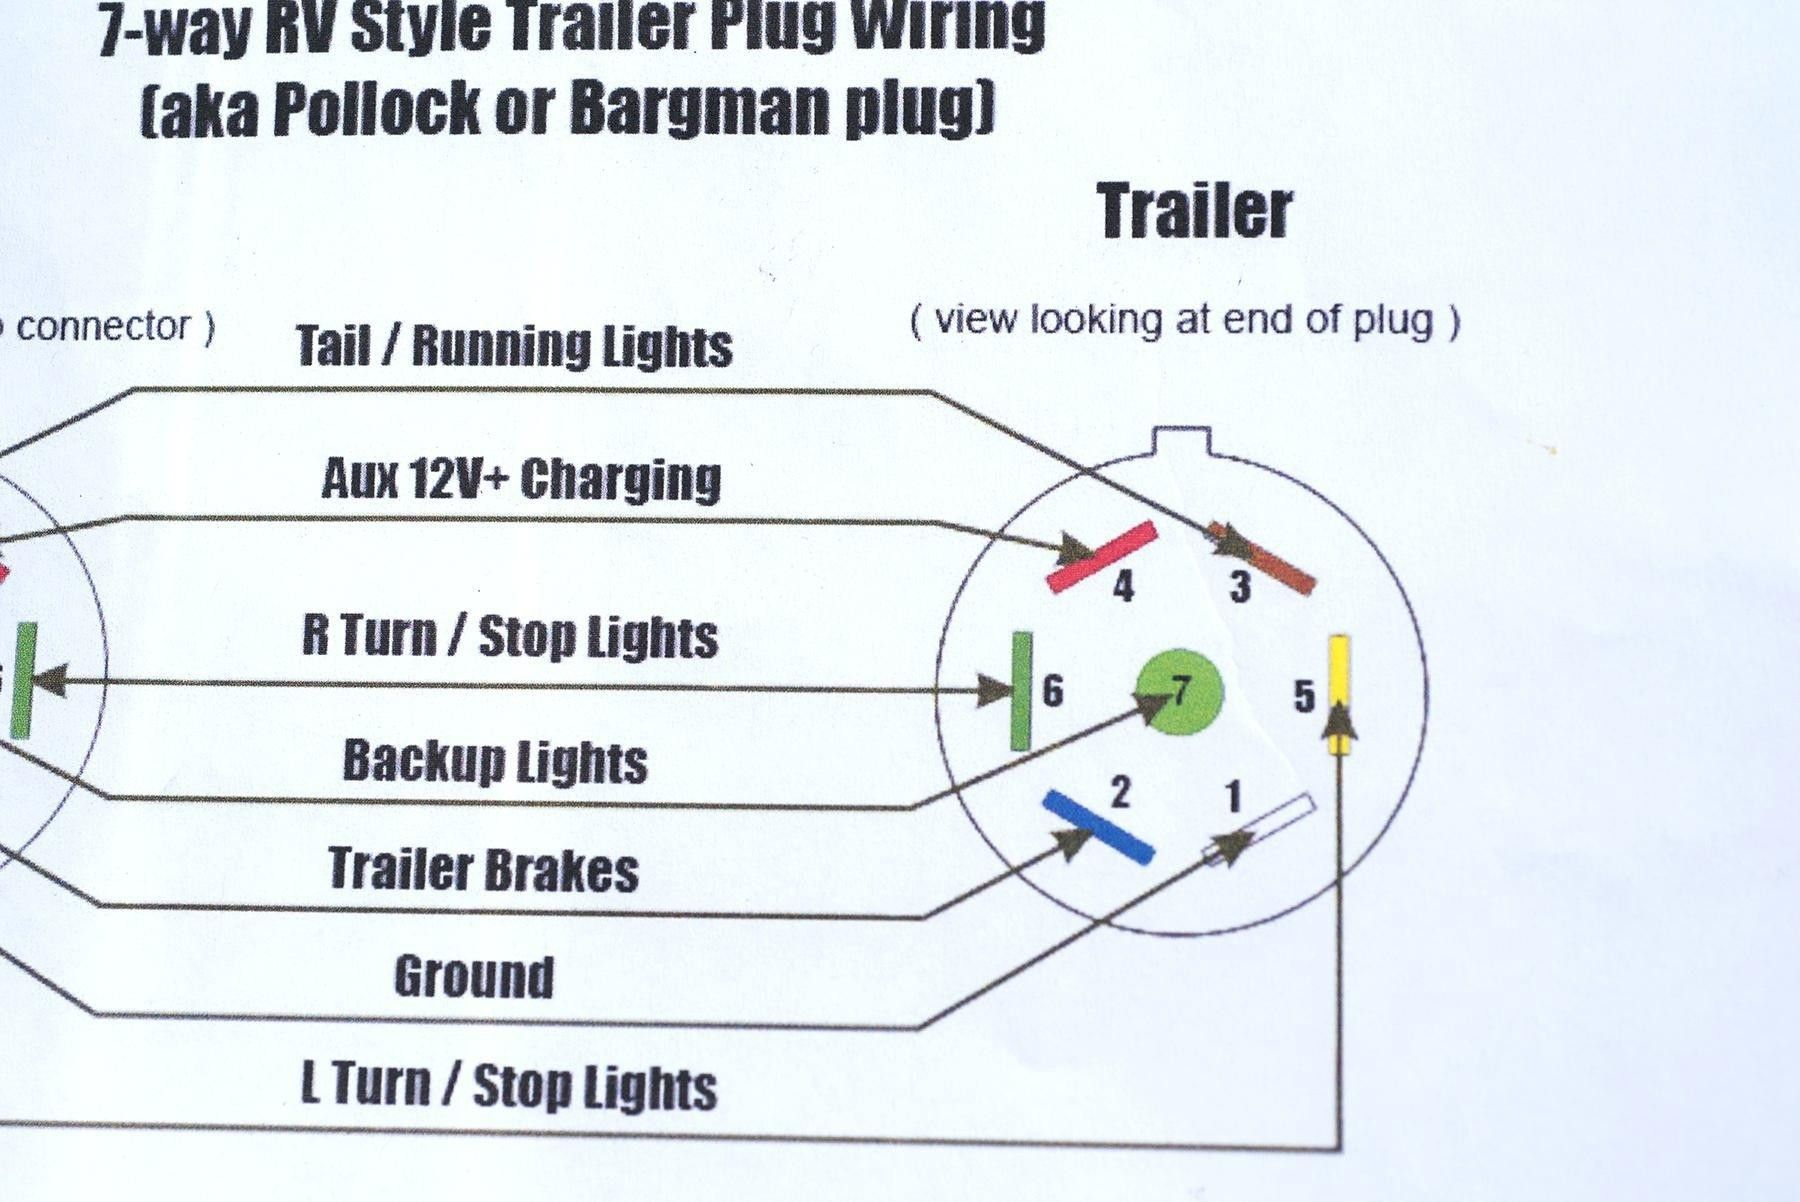 hight resolution of new 1998 dodge ram 1500 trailer wiring diagram diagram diagramsample diagramtemplate wiringdiagram